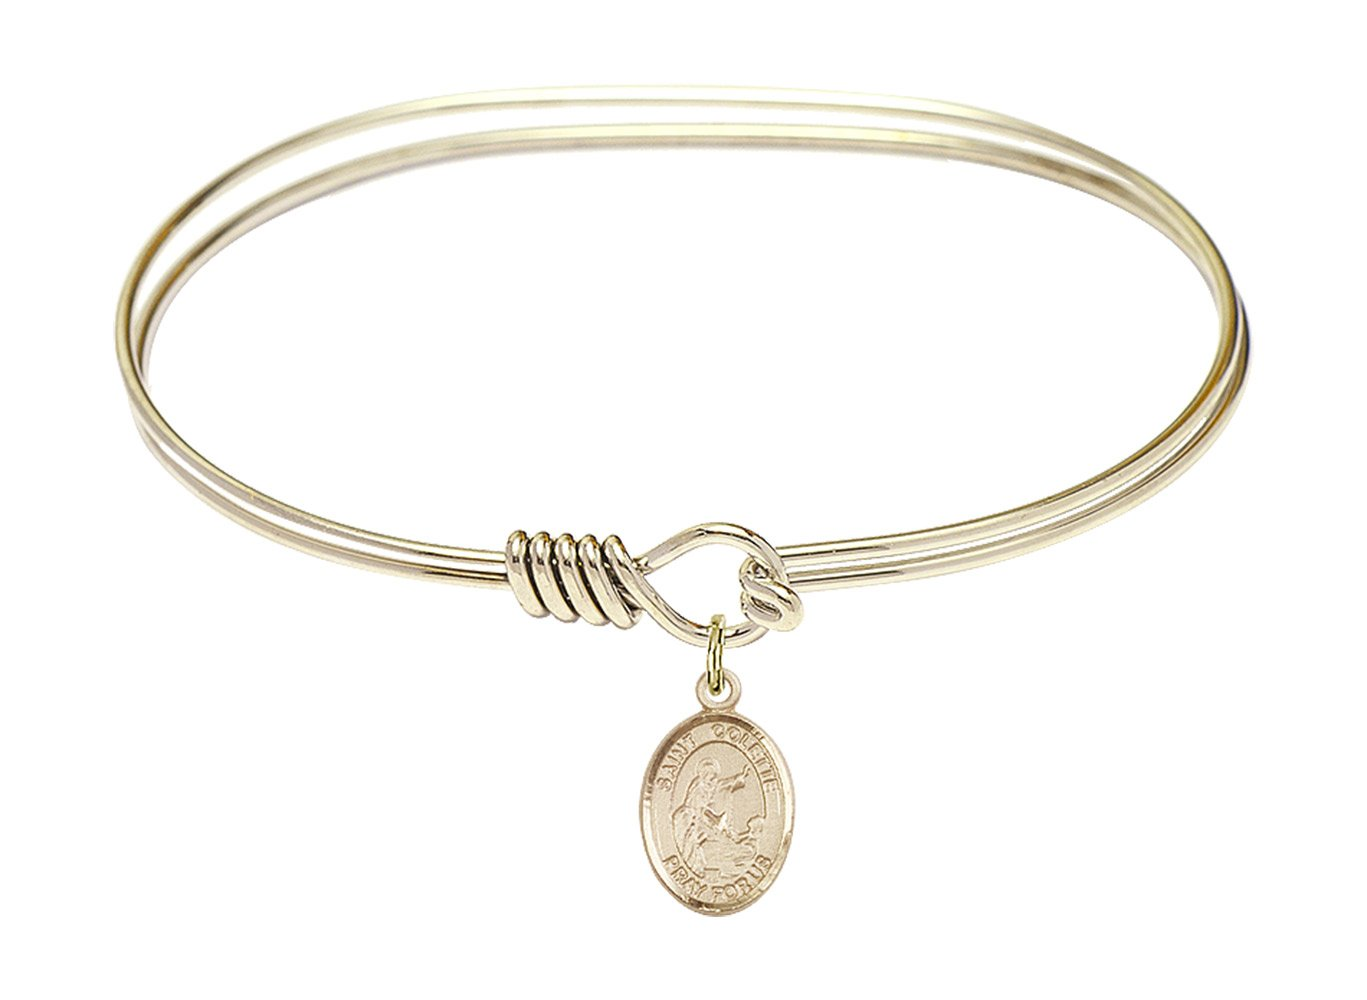 7 inch Oval Eye Hook Bangle Bracelet w/St. Colette in Gold-Filled